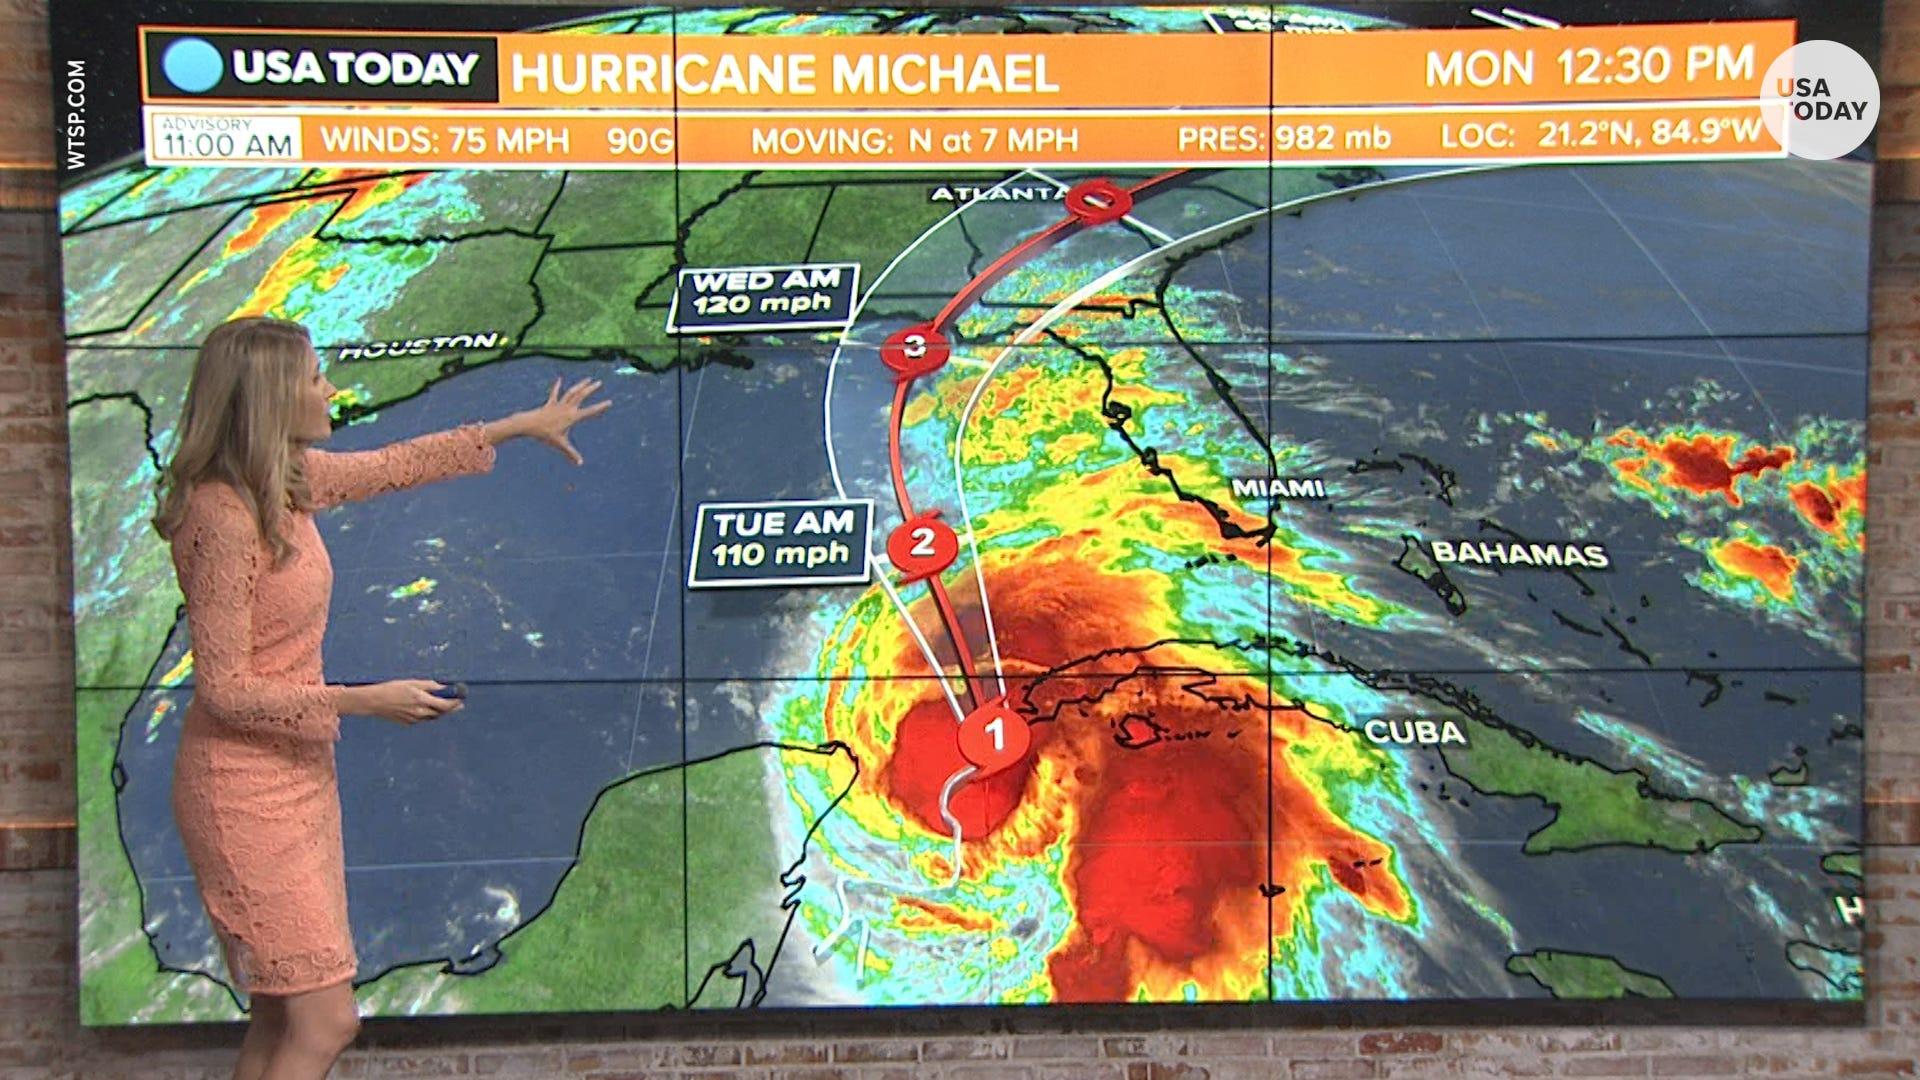 Hurricane Michael intensifies as it heads towards Gulf Coast on